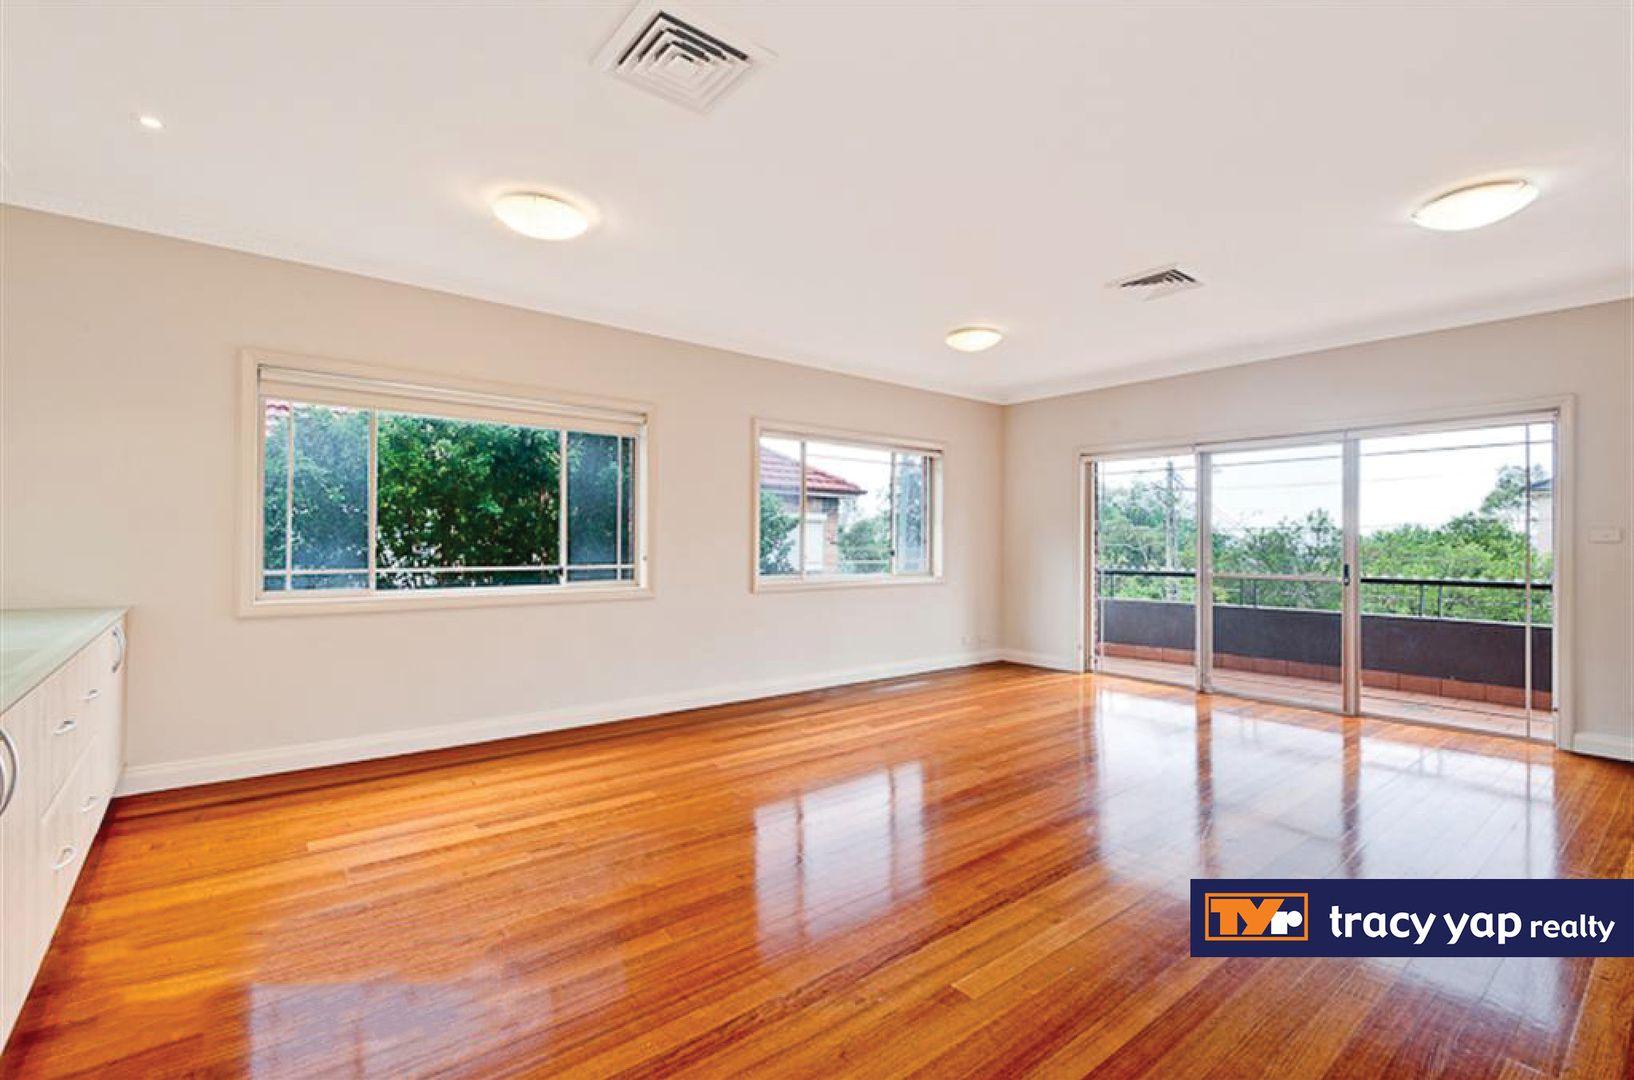 39 Goodwin Street, Denistone NSW 2114, Image 1